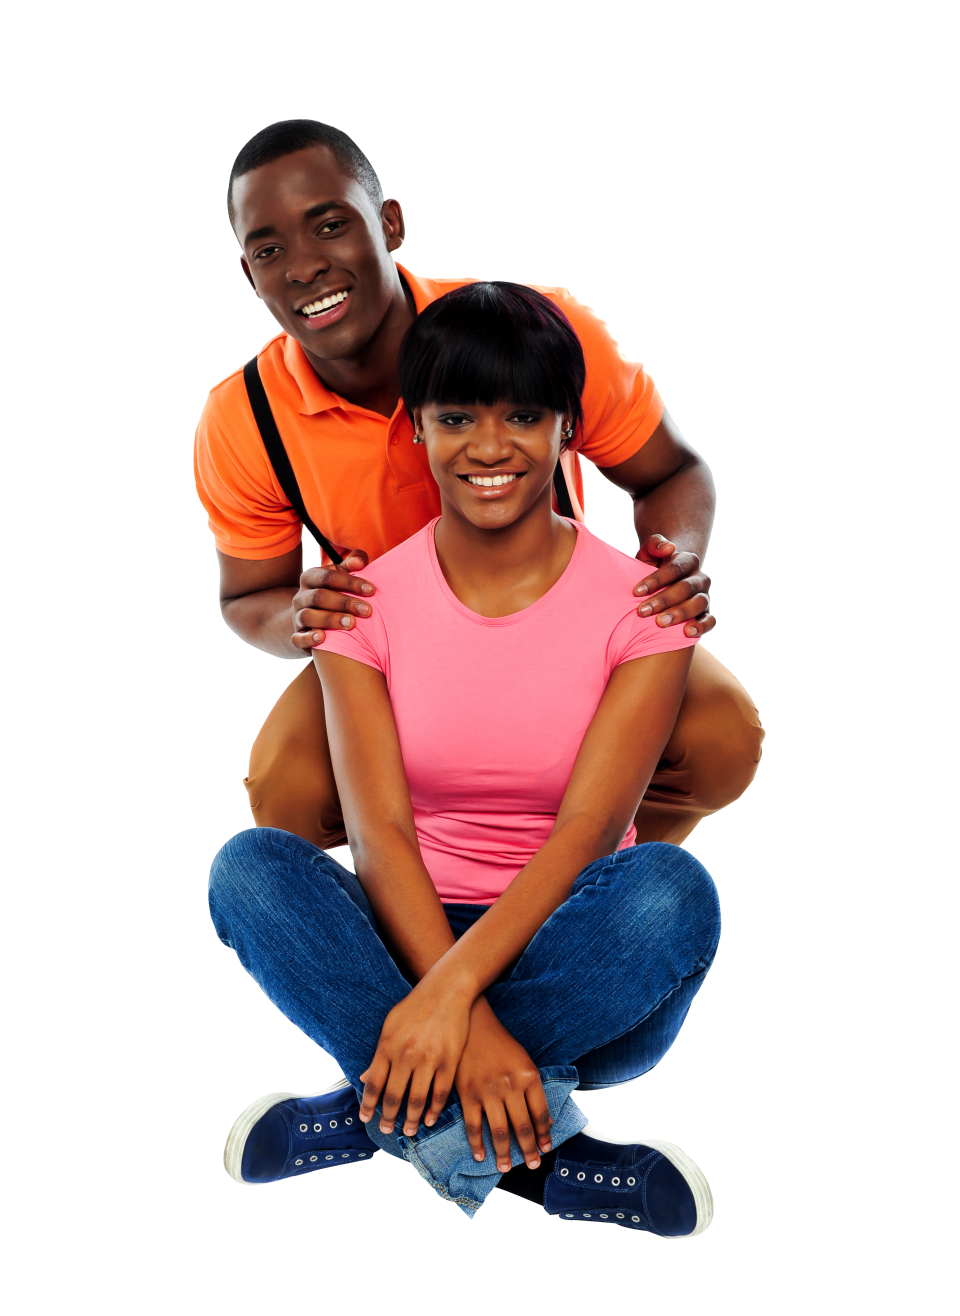 Romantic Couple PNG Image